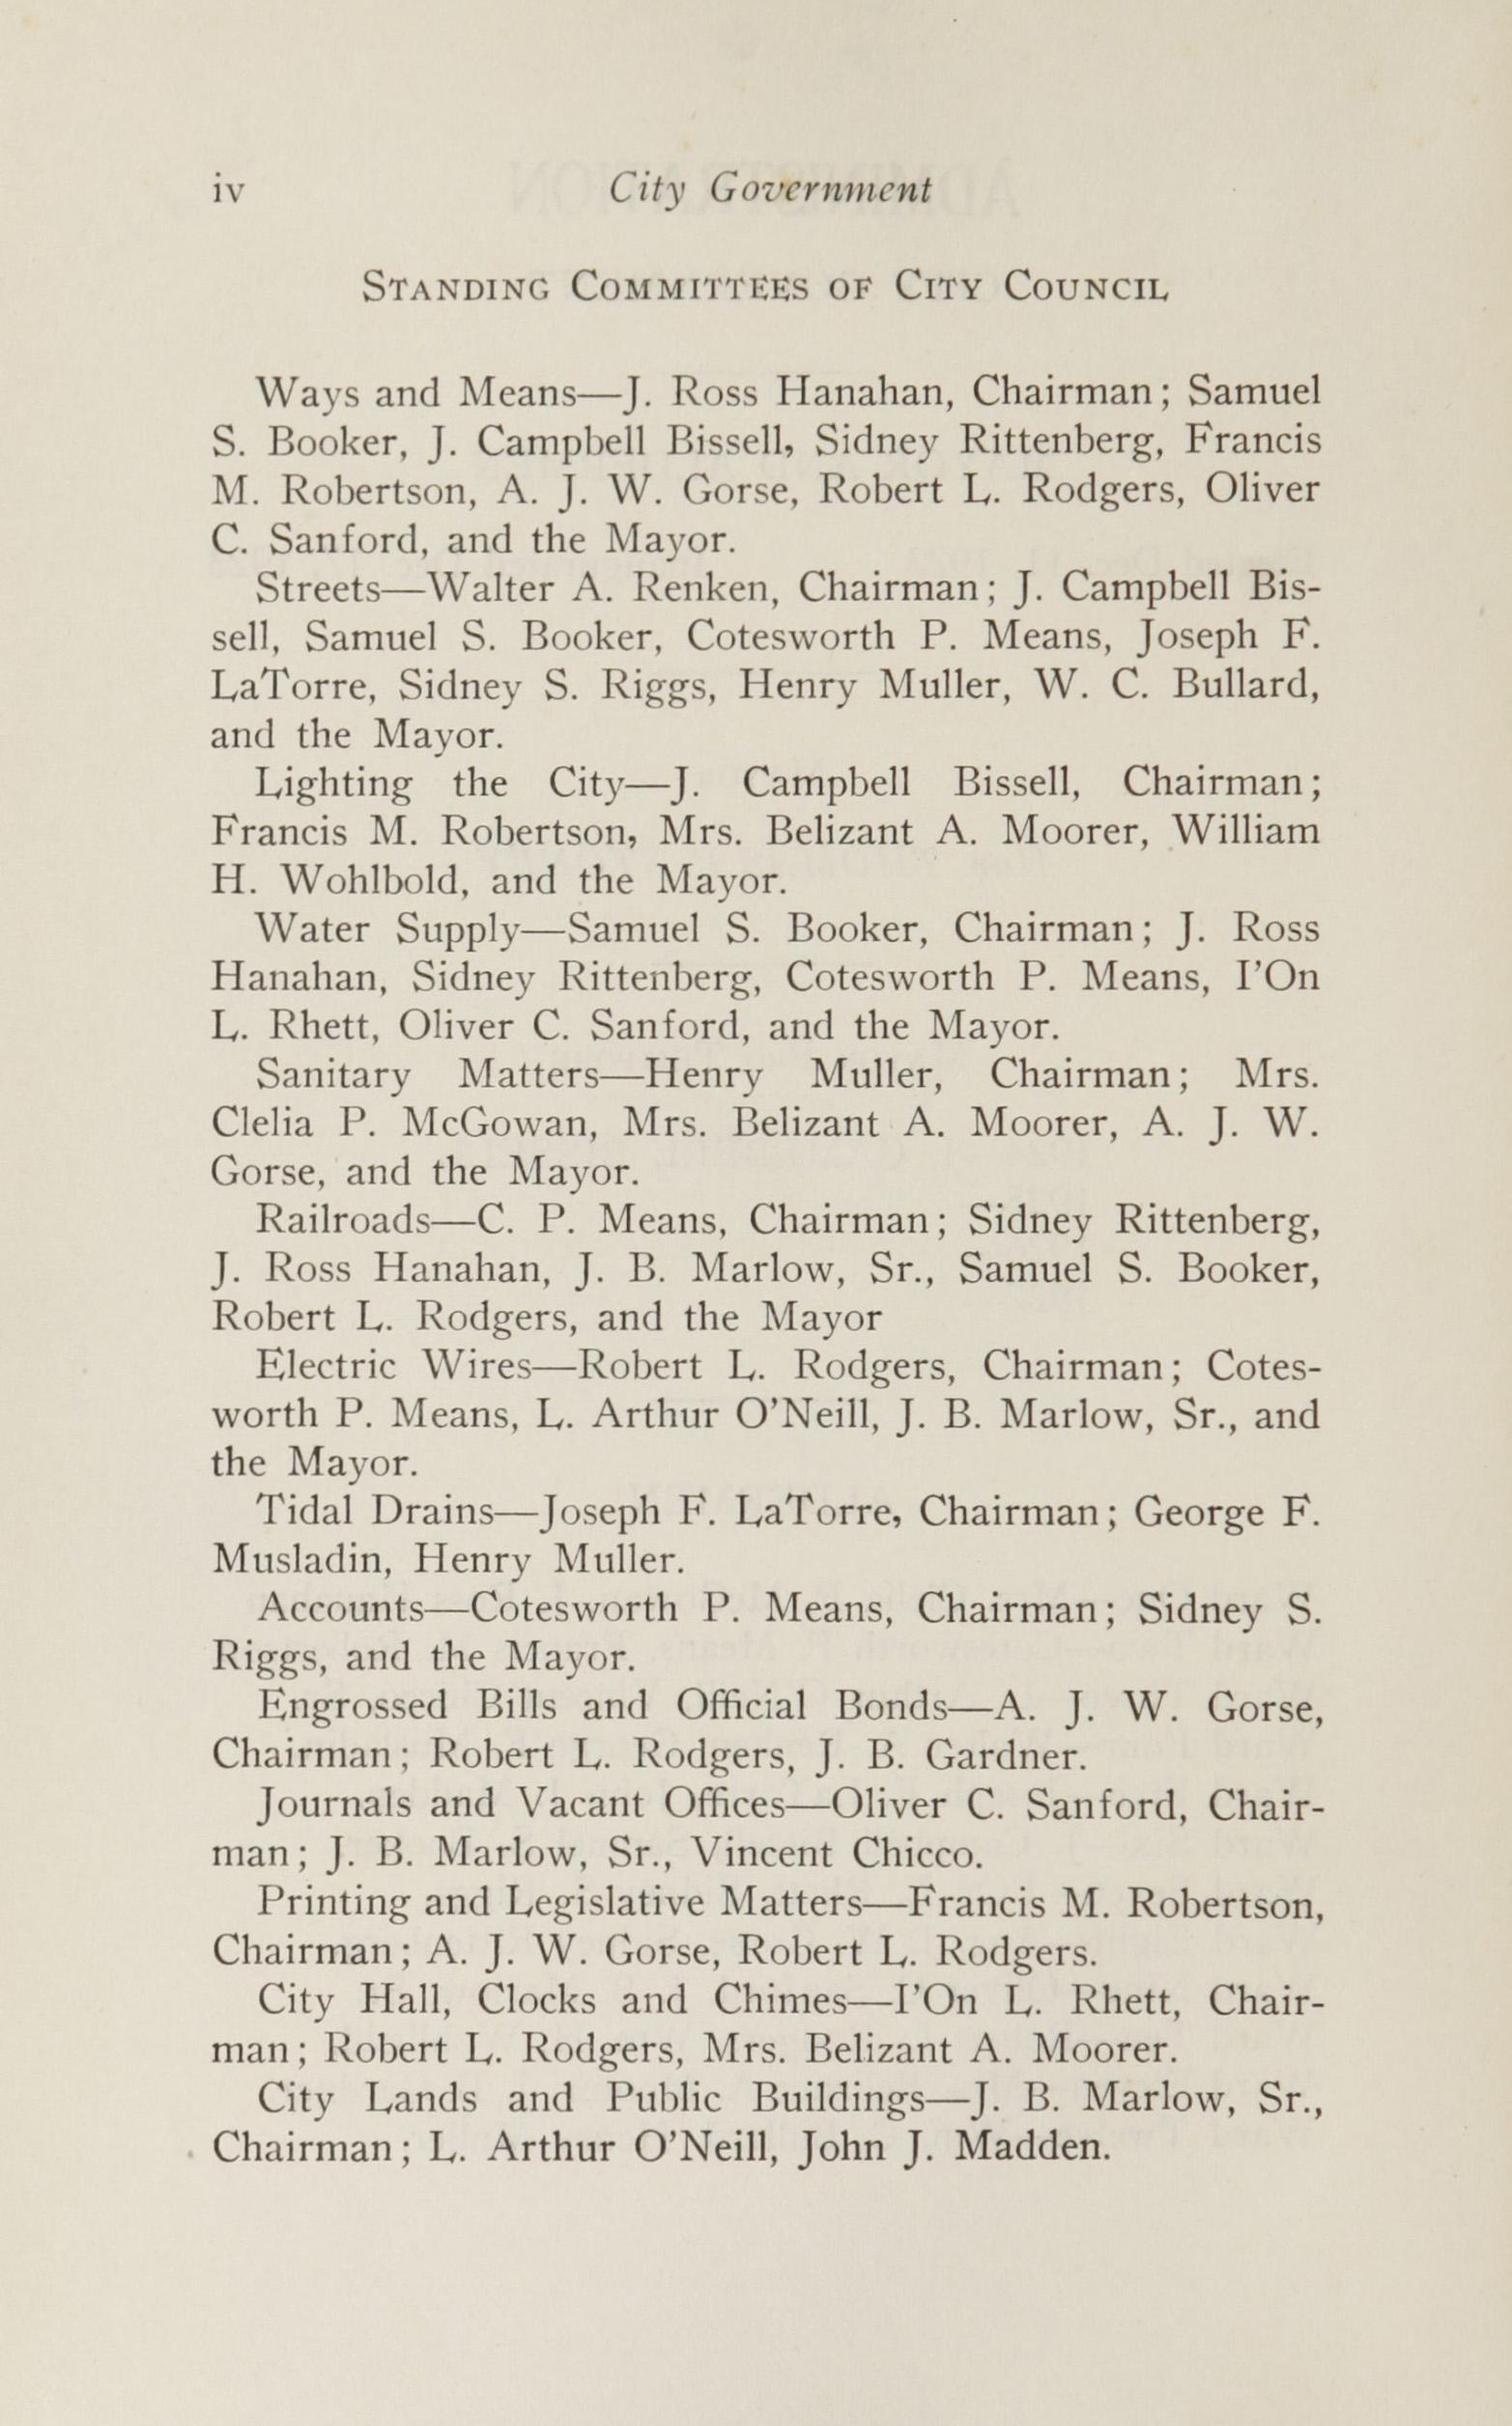 Charleston Yearbook, 1924, page iv